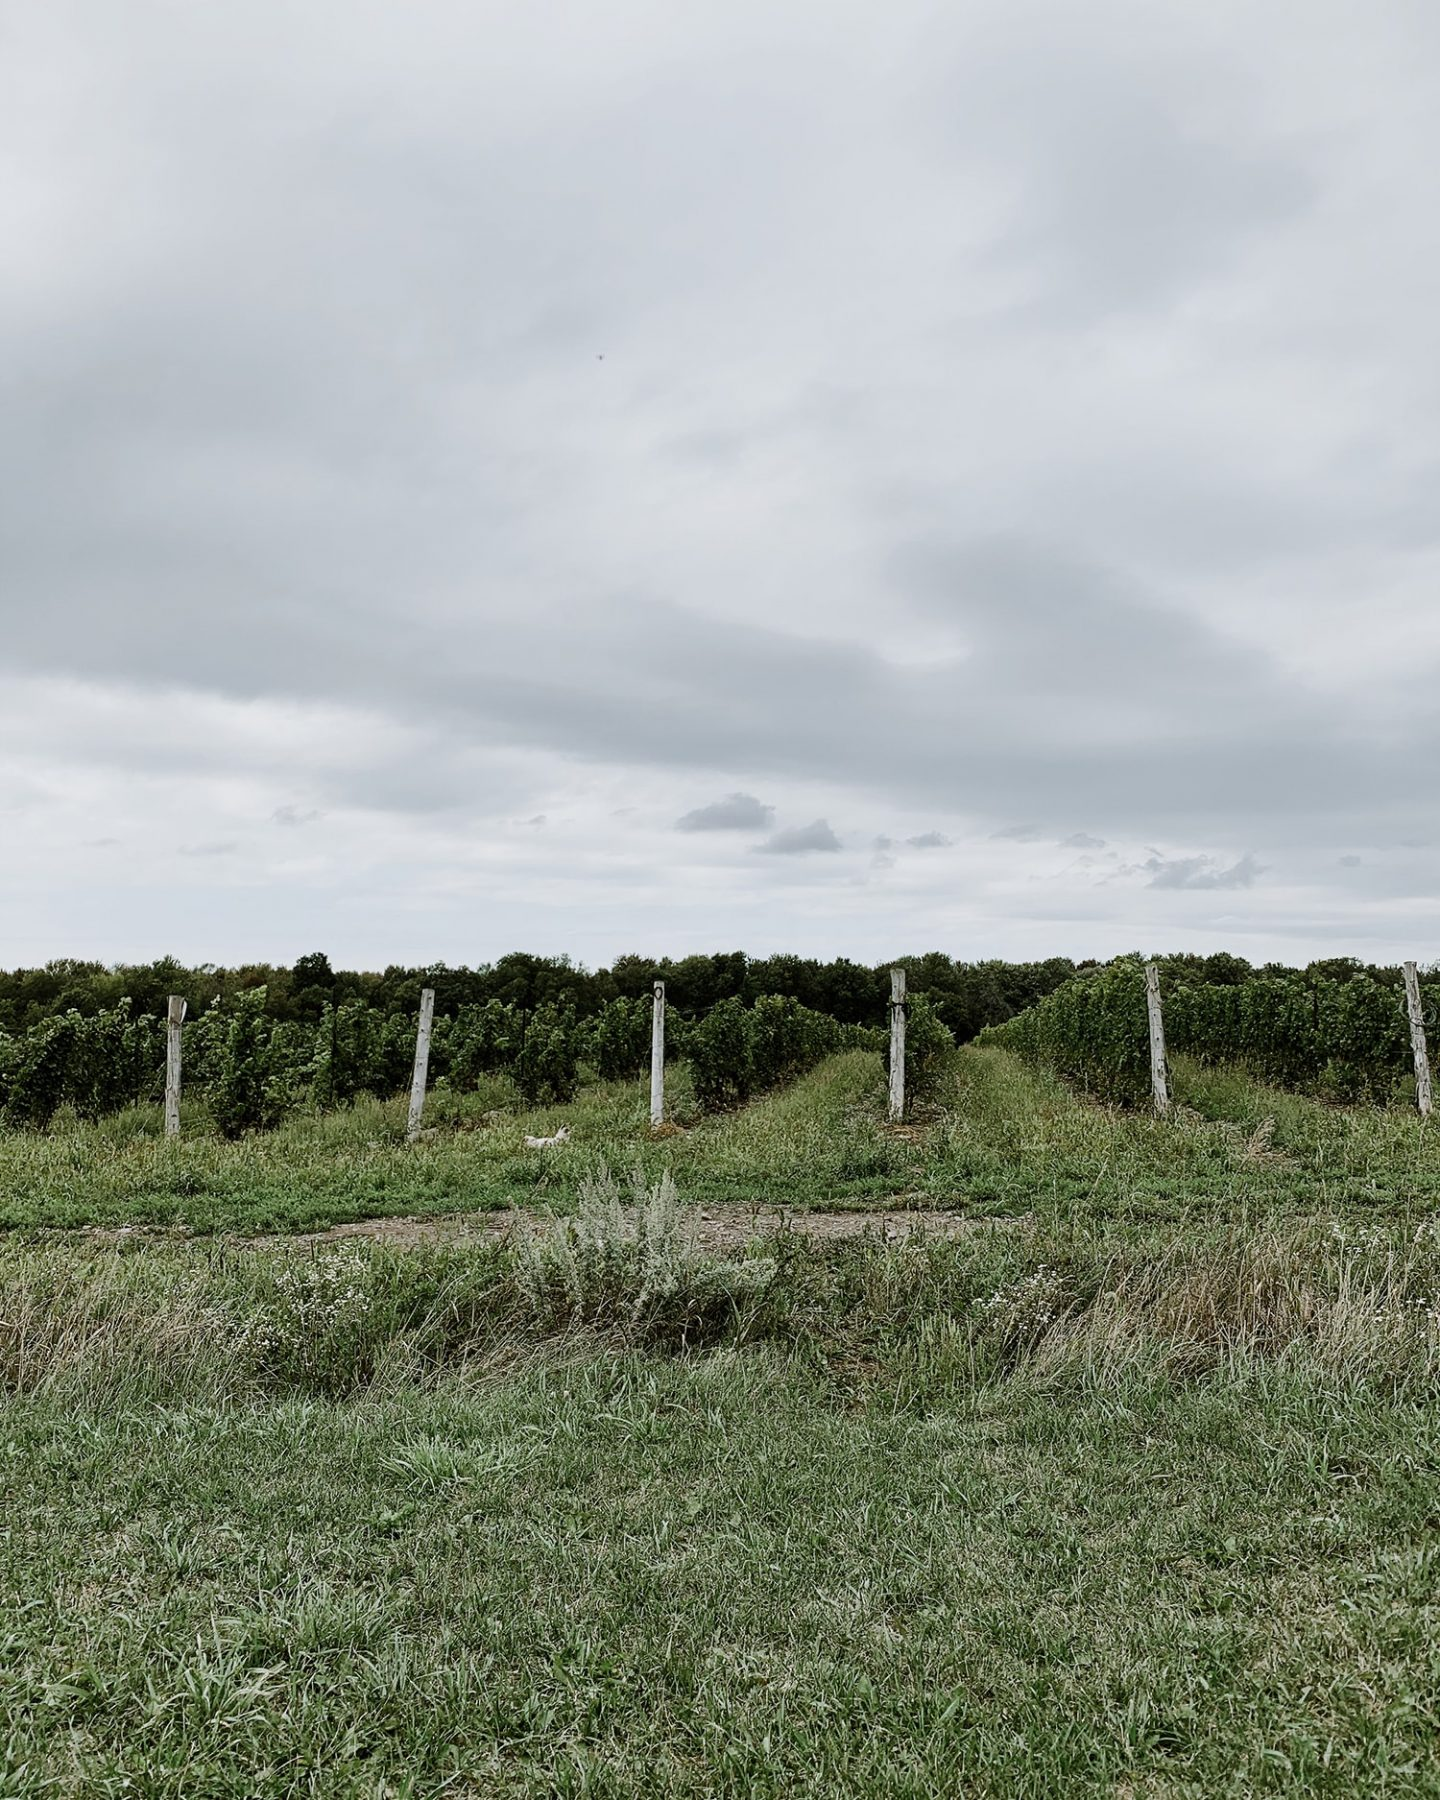 Hinterland Wine Company vineyards in Prince Edward County